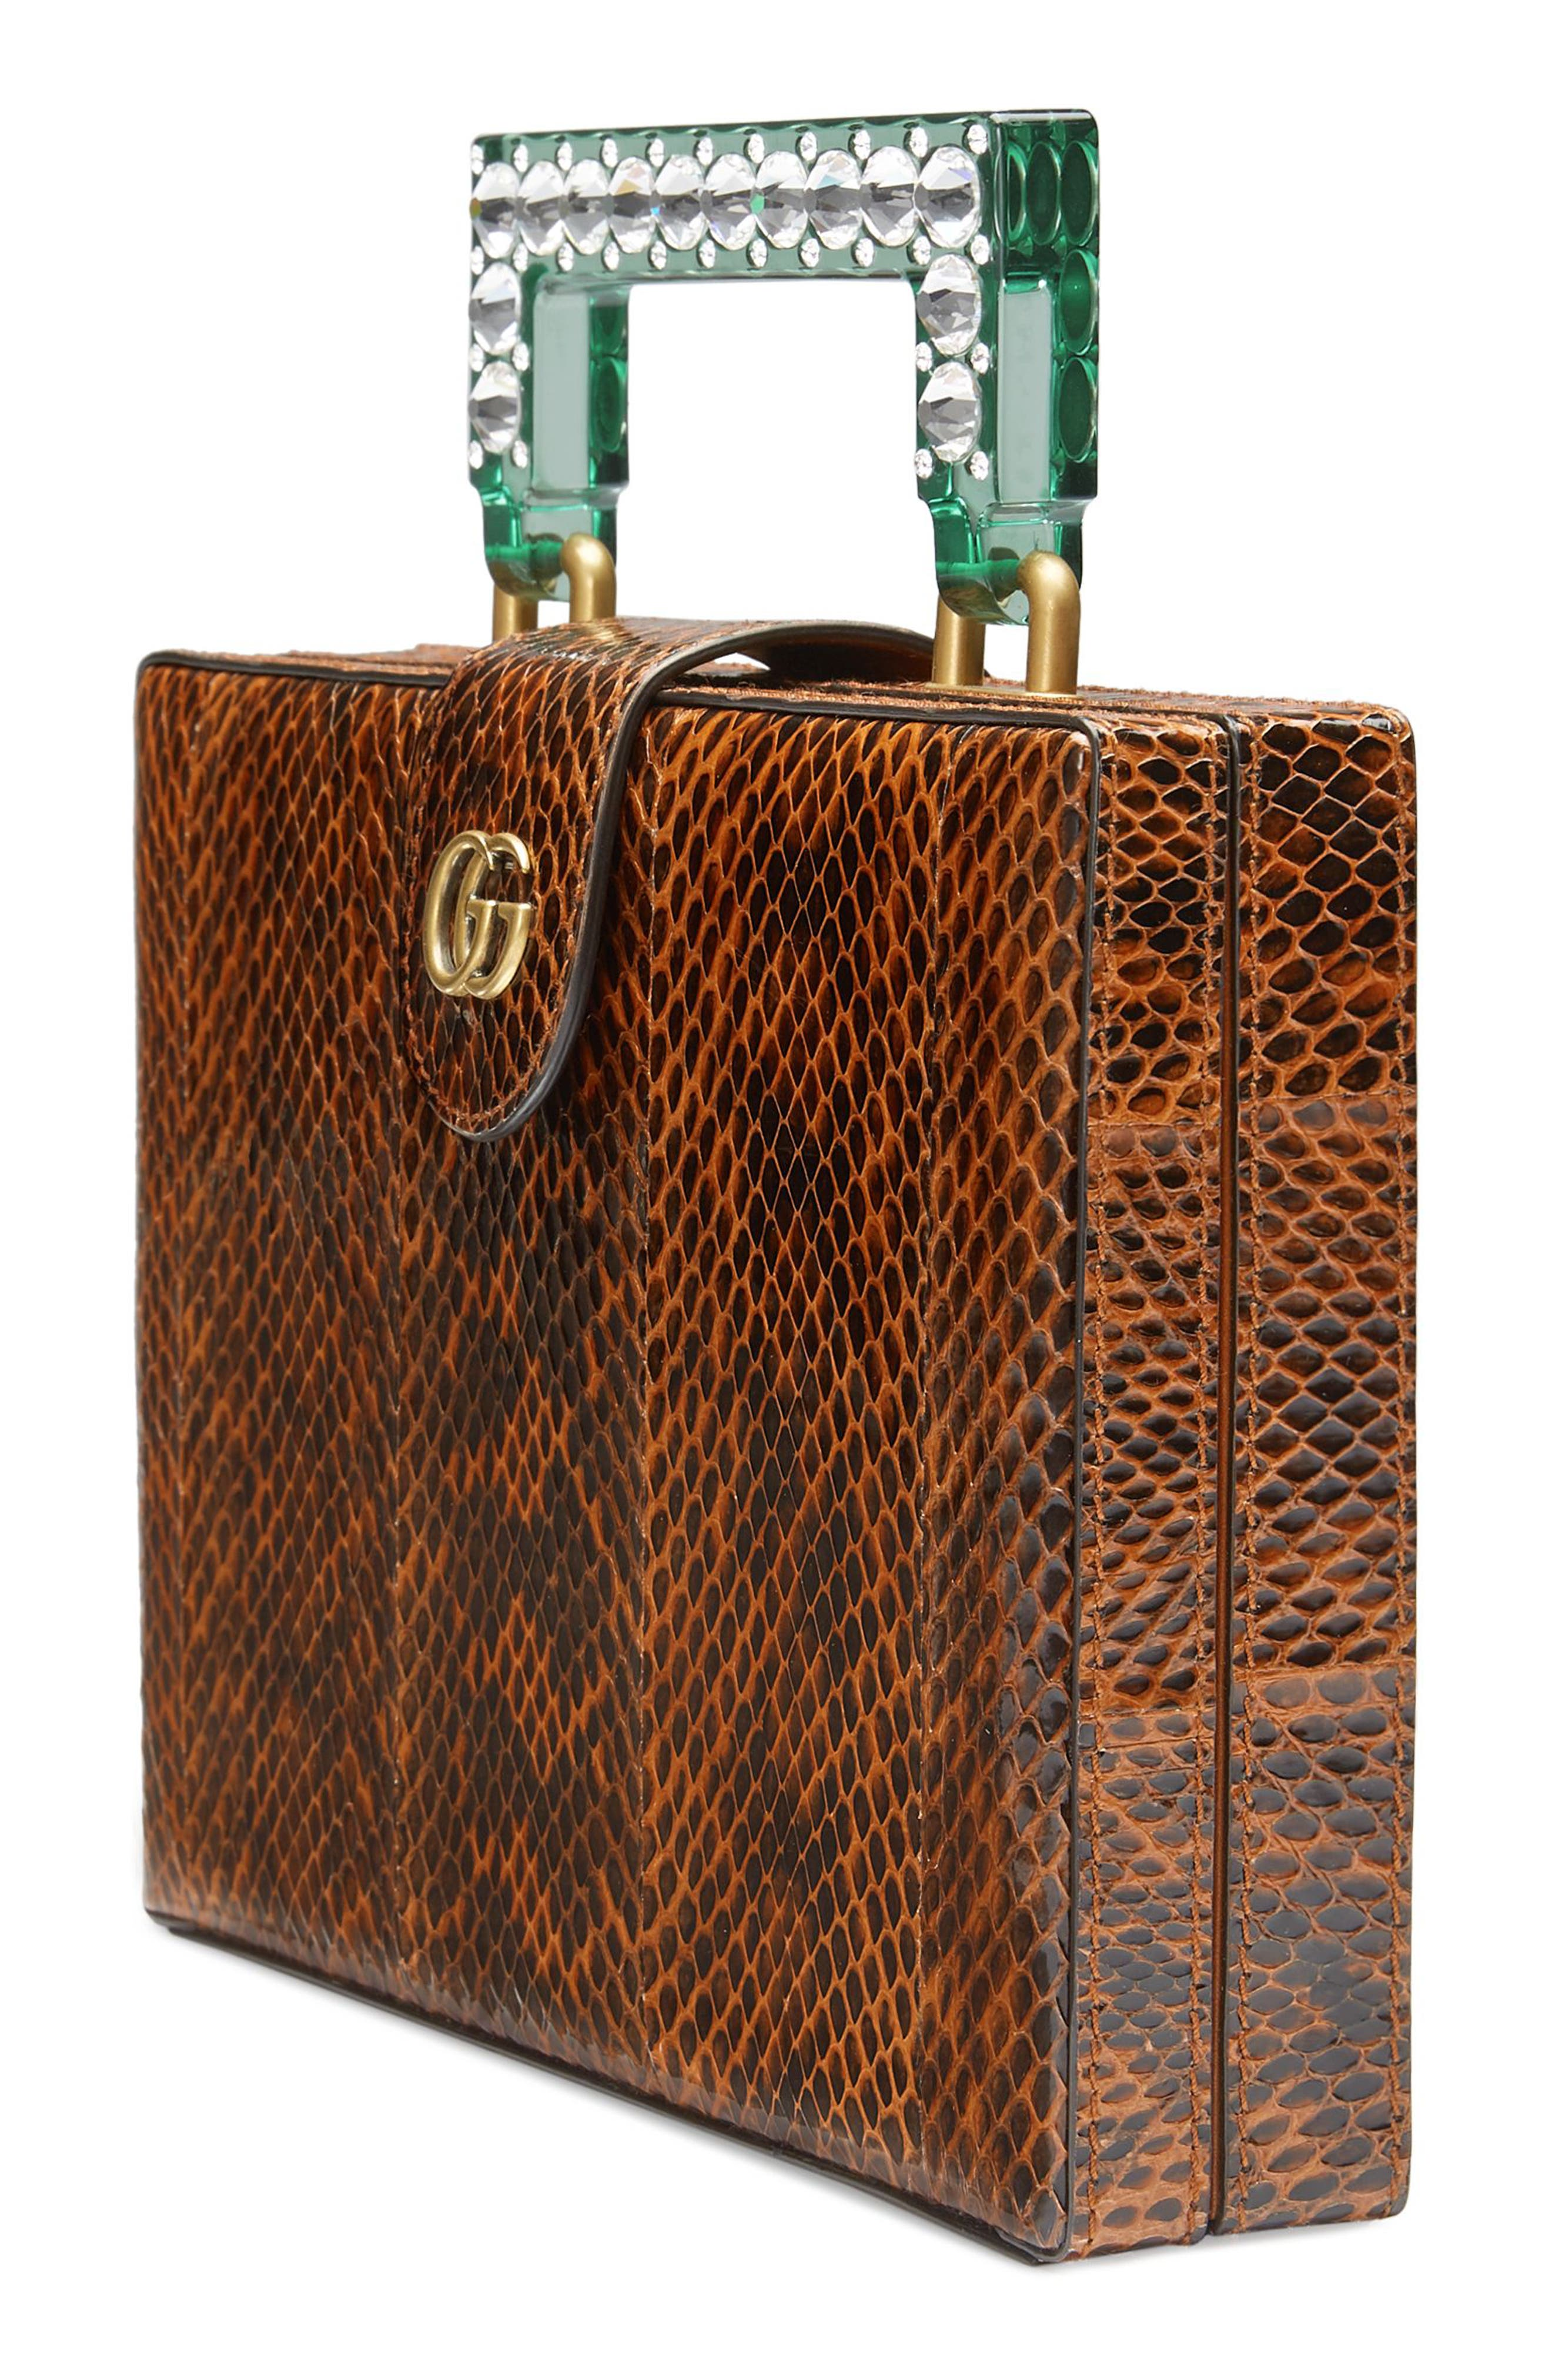 Broadway Genuine Snakeskin Box Clutch,                             Alternate thumbnail 4, color,                             Bright Cuir/ Verde Crystal